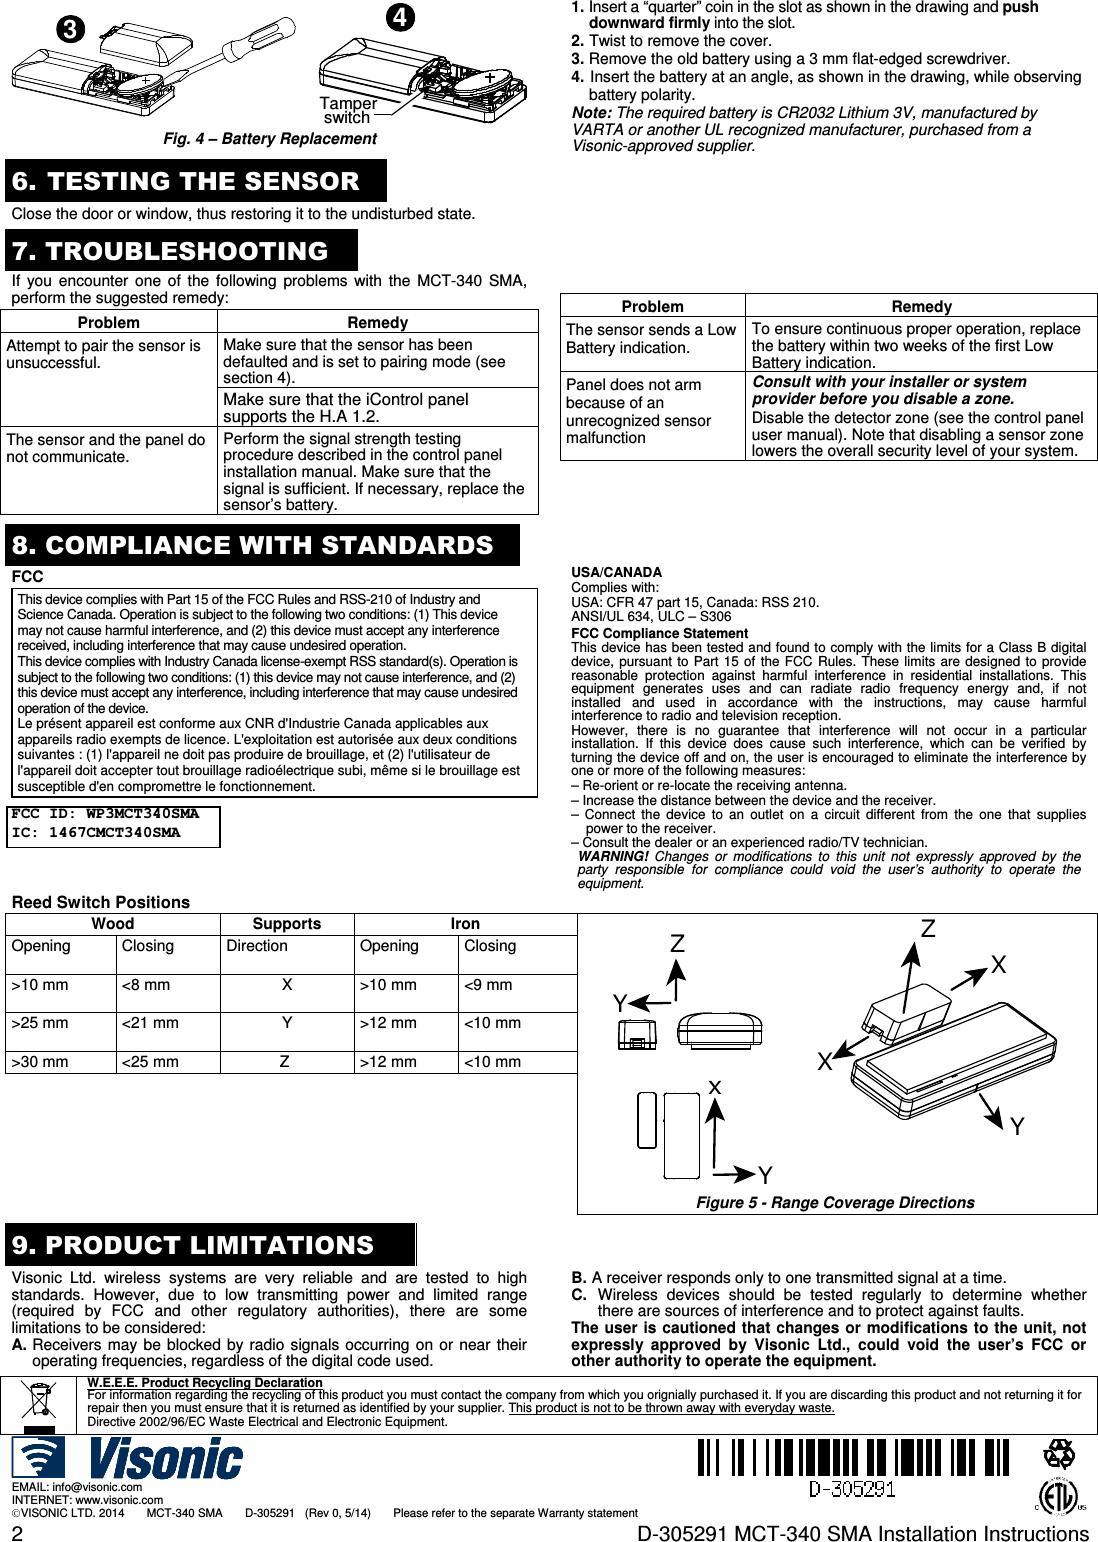 Visonic MCT340SMA WIRELESS CONTACT SENSOR User Manual D